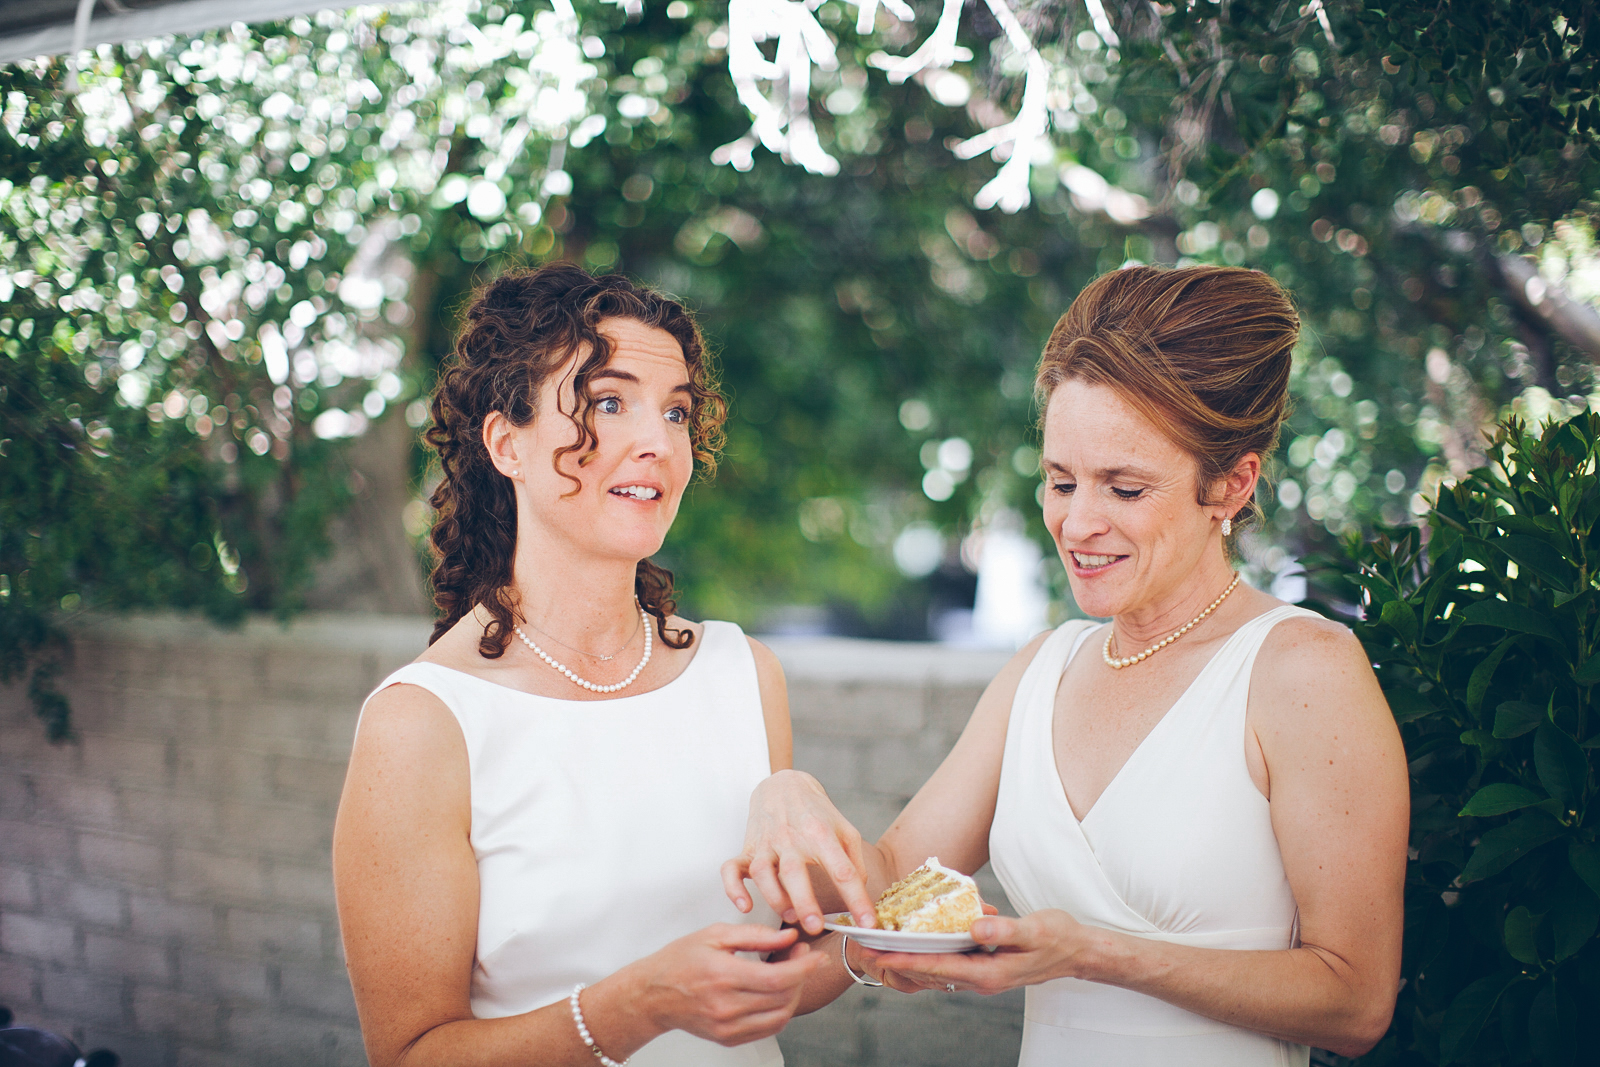 Riverside_ca_wedding_photography_marguerite_carolyn_ebony_siovhan_bokeh_photography_58.jpg